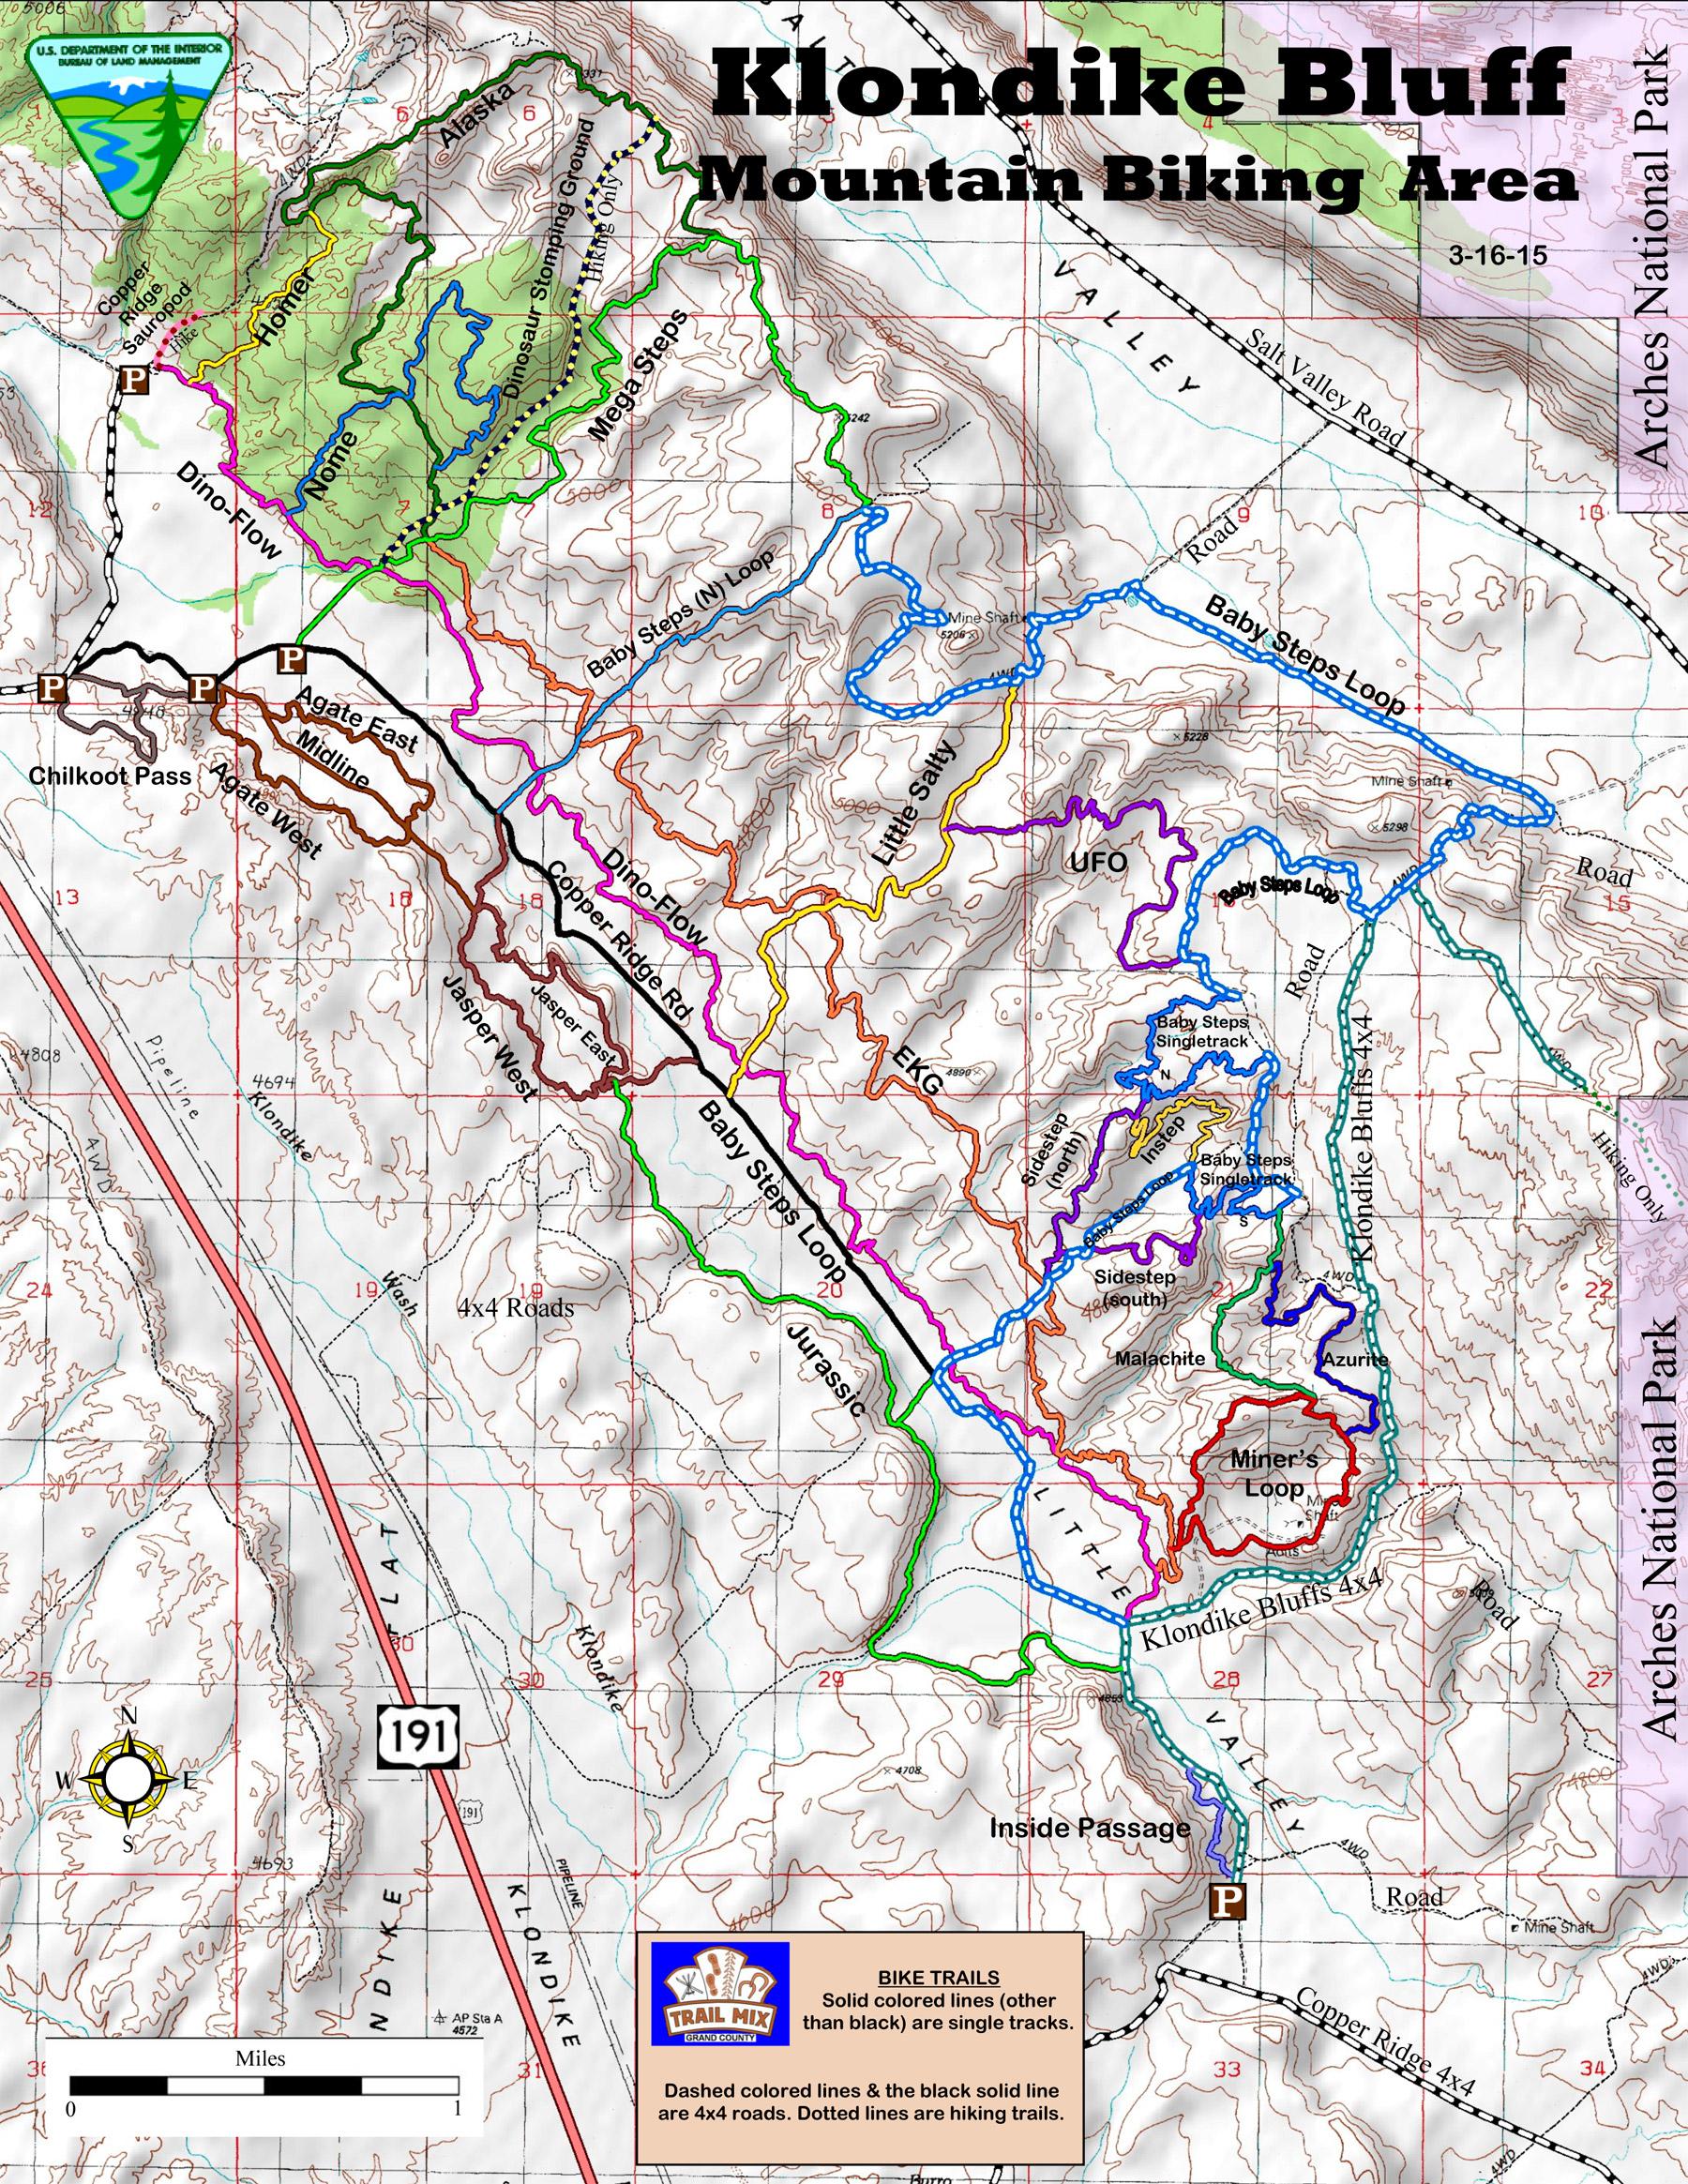 Trail Guide for Mountain Biking in Moab Utah